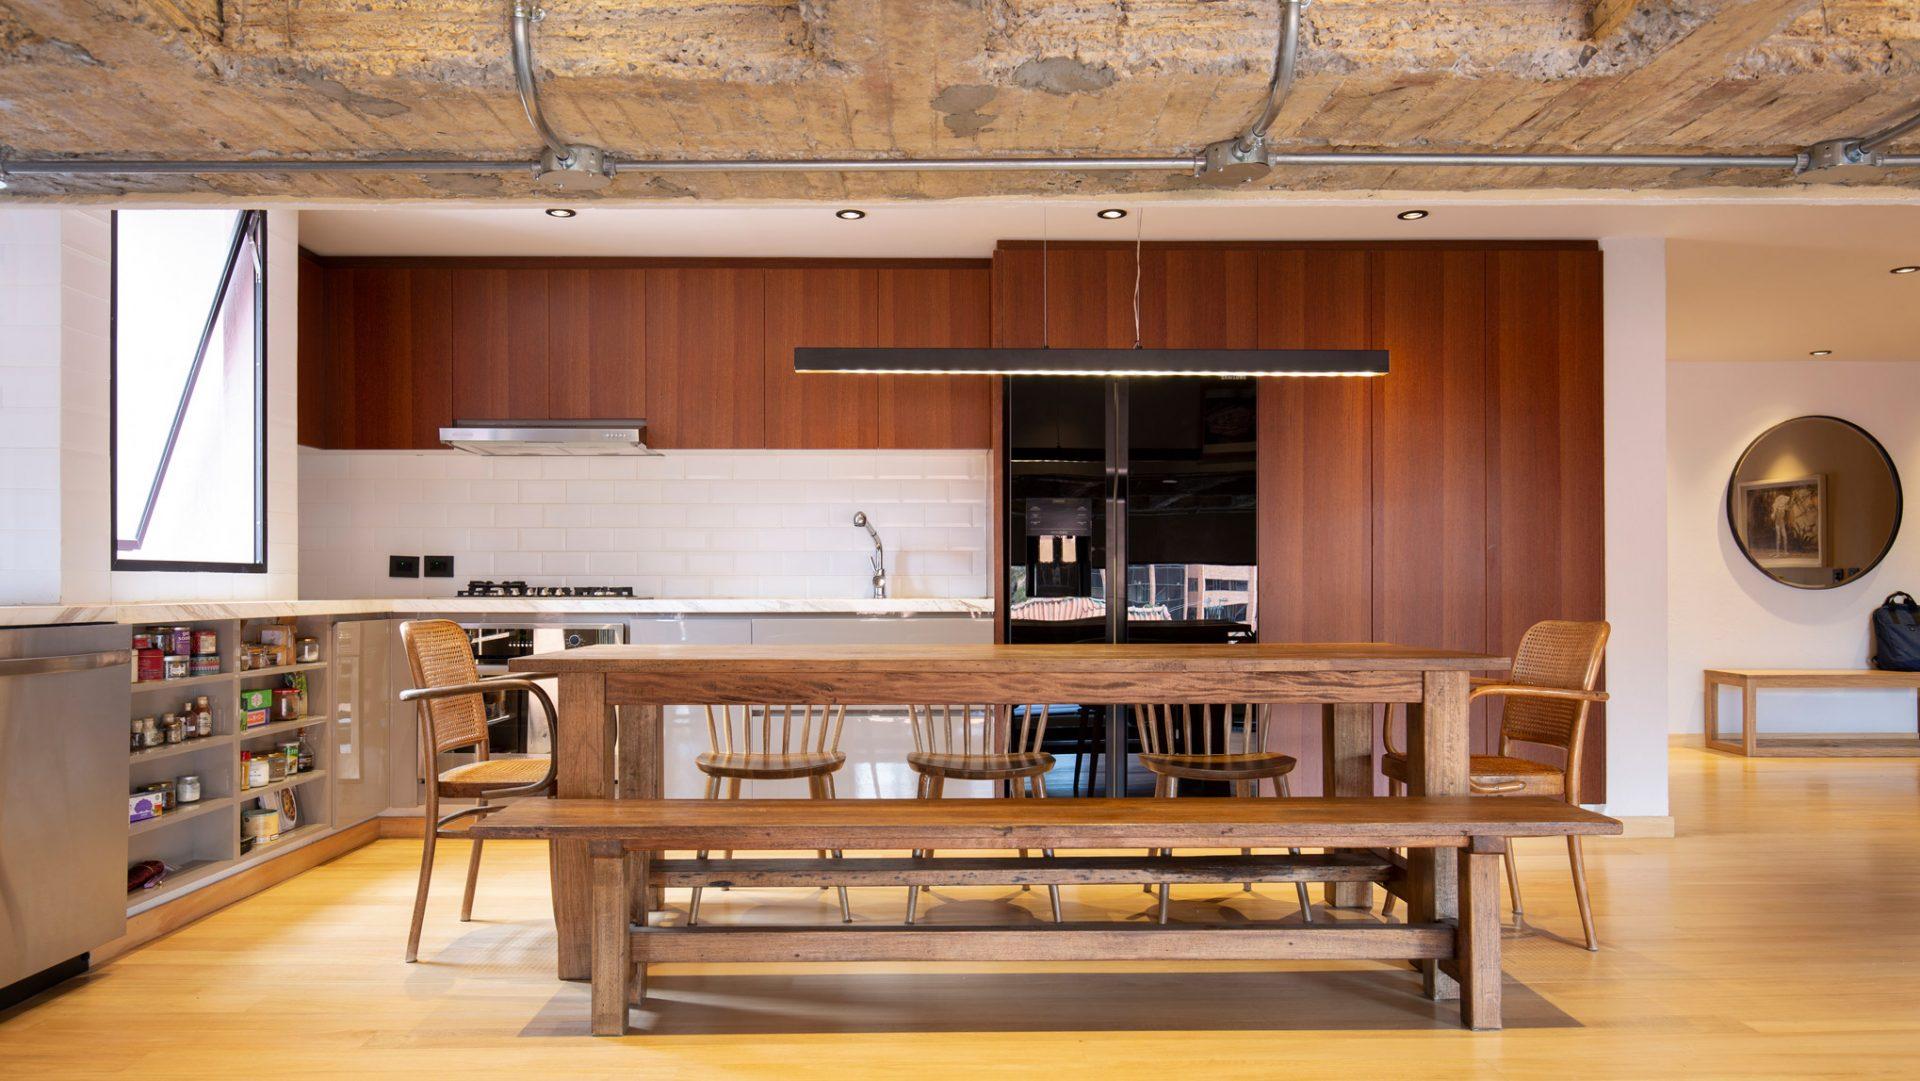 09.MLS_arquitectura_taller_tragaluz_interior_dutch_bogota_colombia_simon_bosch_photography